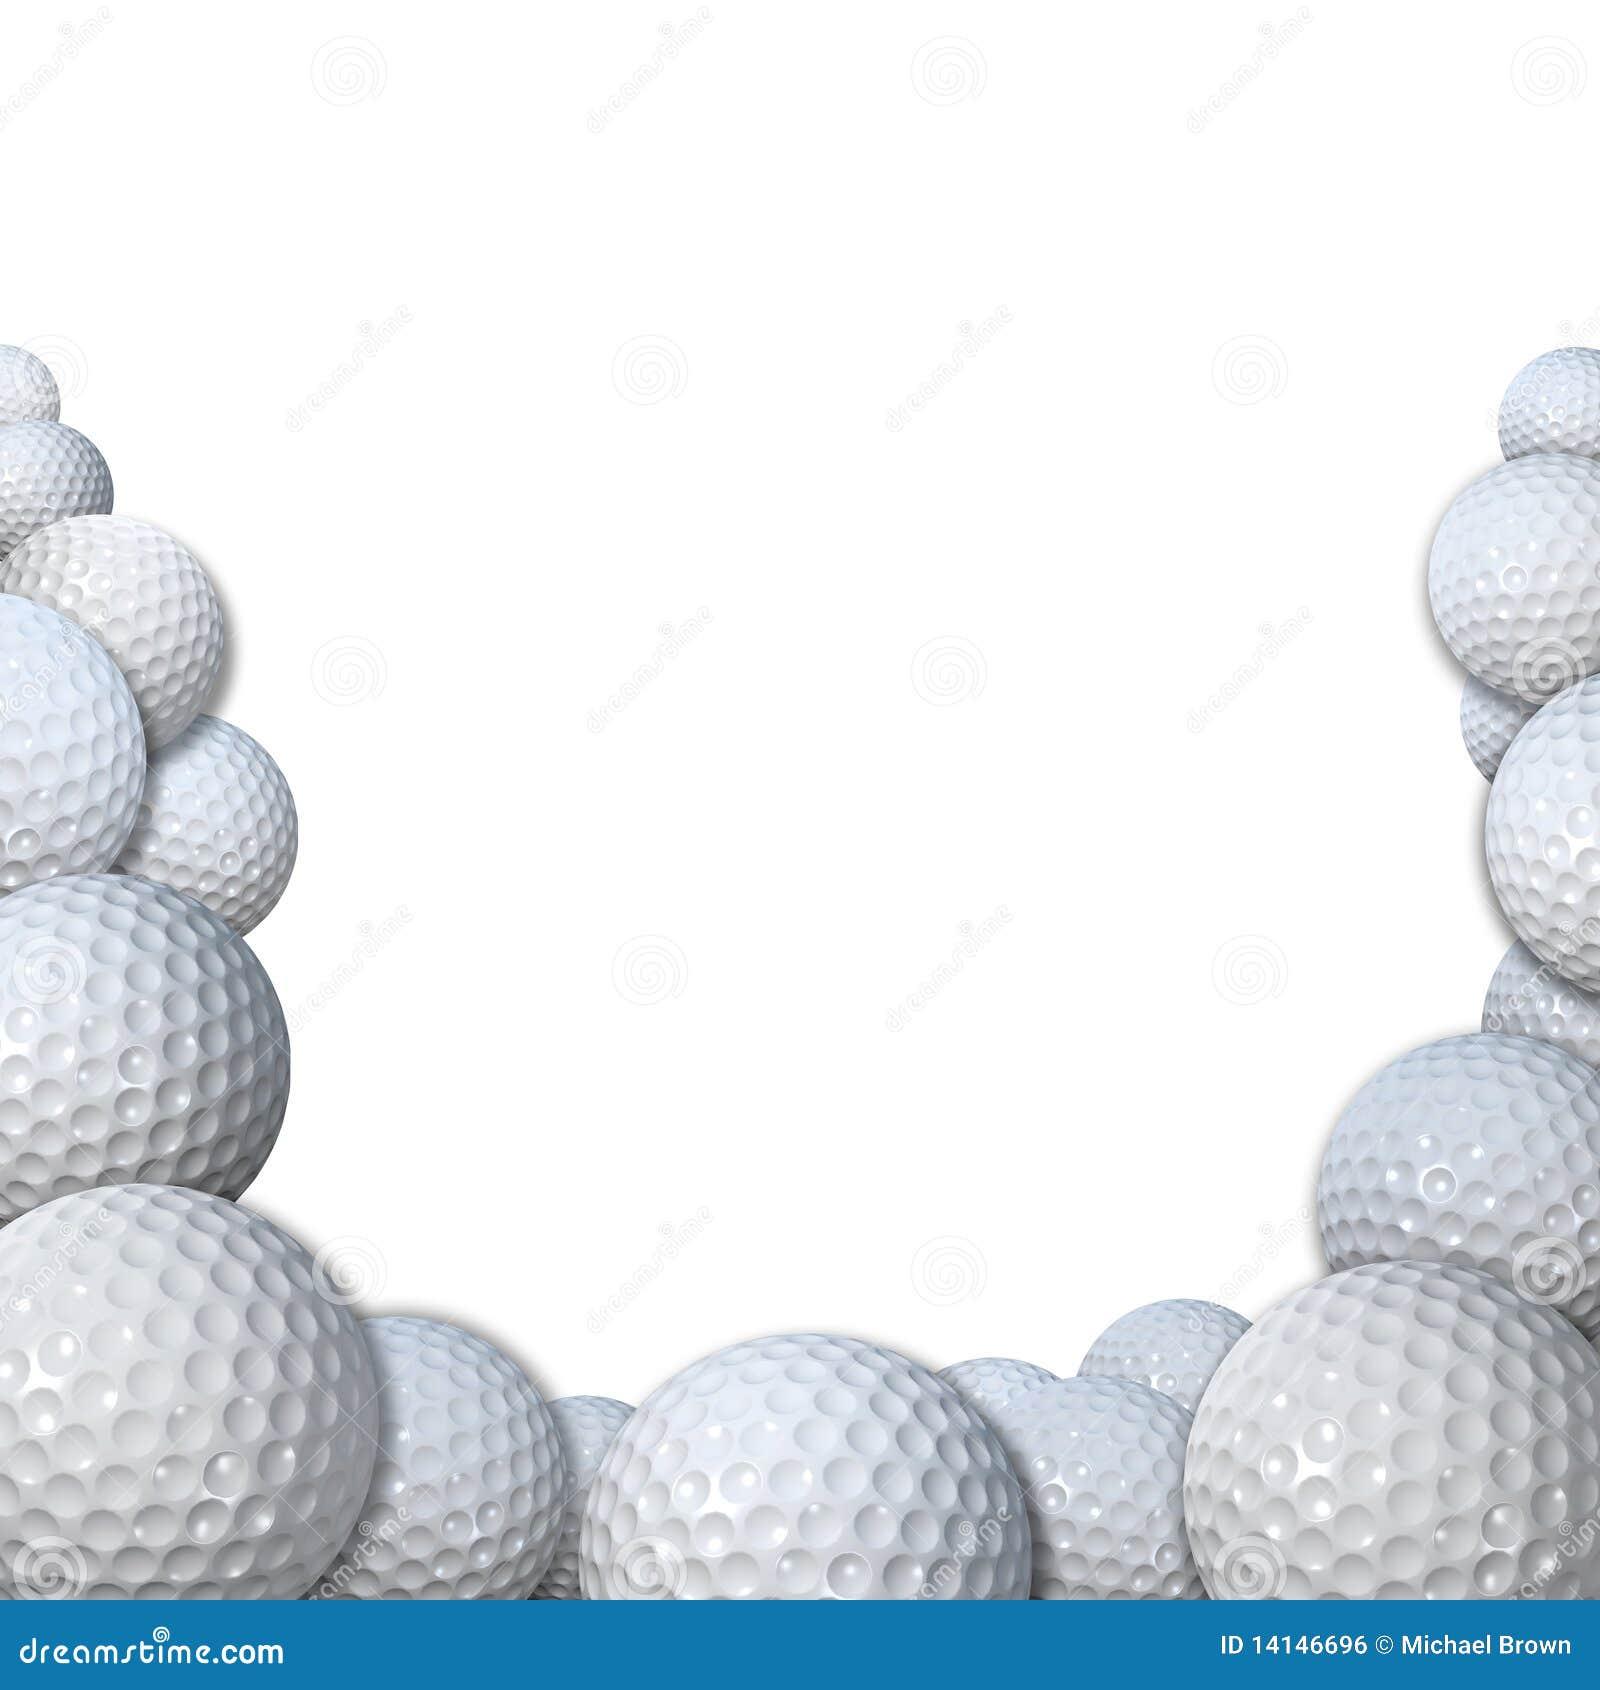 many golfballs as golf sports border copy space stock illustration rh dreamstime com Free Food Clip Art Borders Free Clip Art Golf